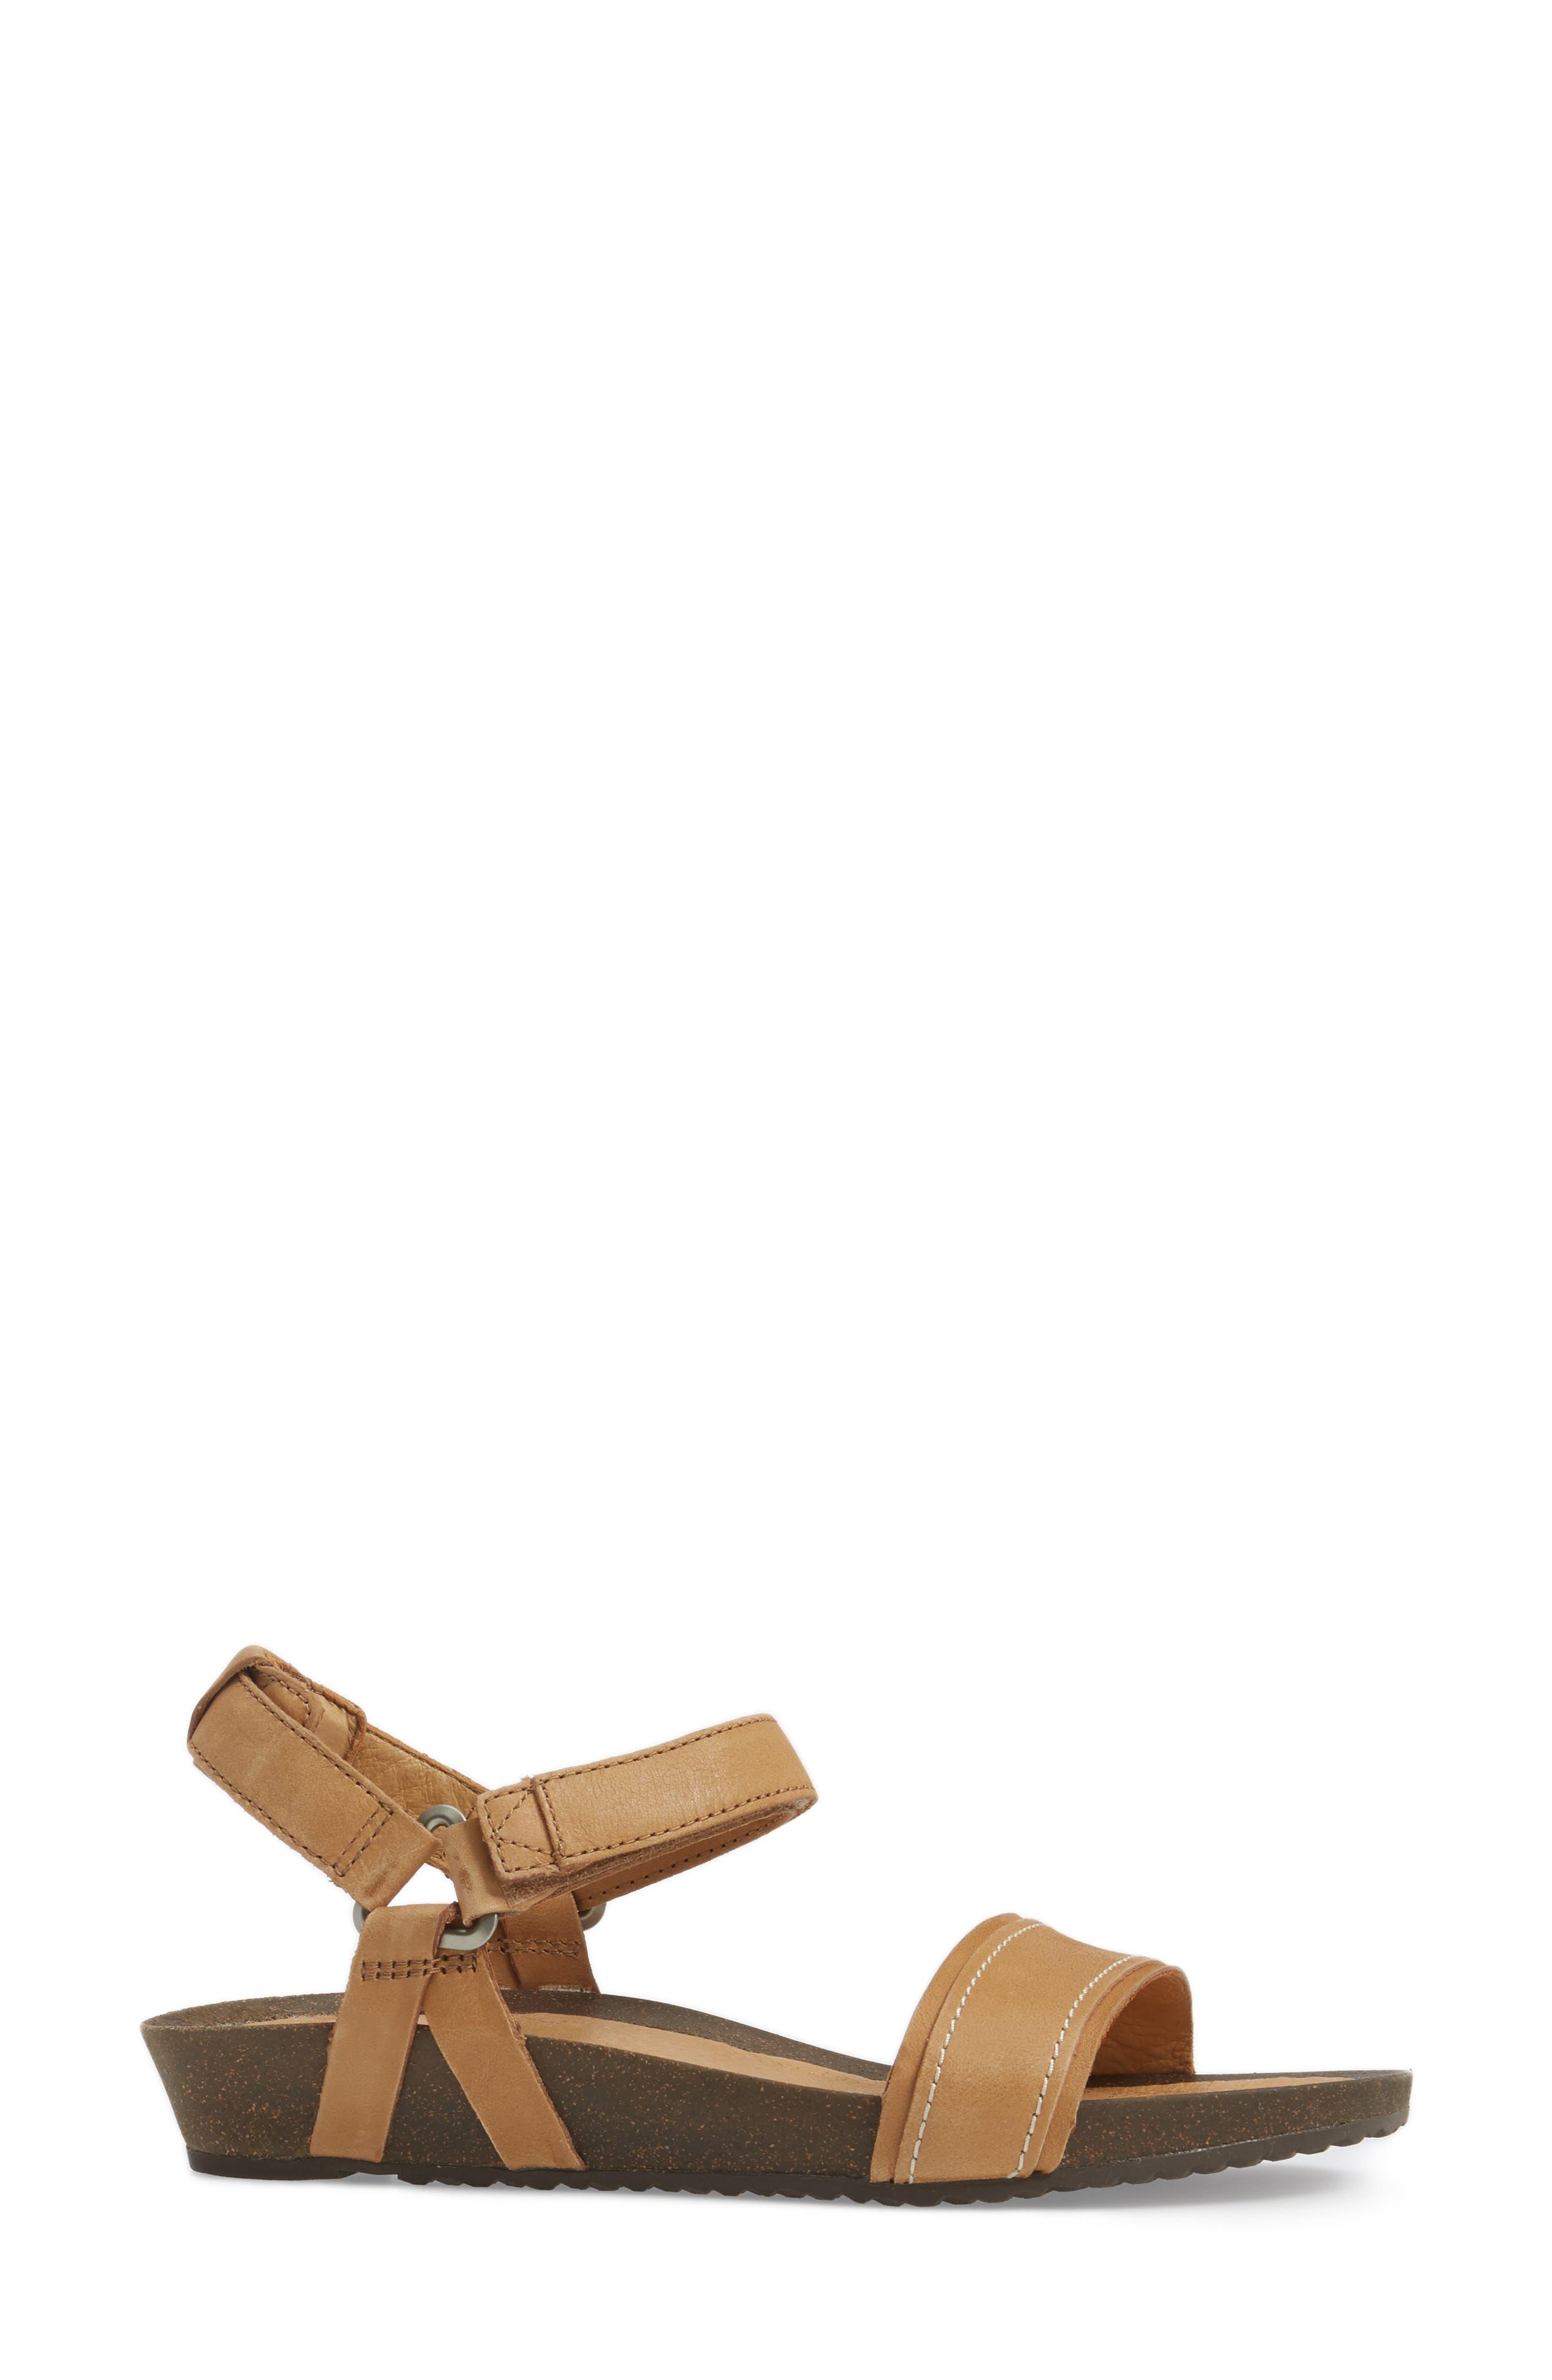 Ysidro Stitch Sandal,                             Alternate thumbnail 3, color,                             Tan Leather